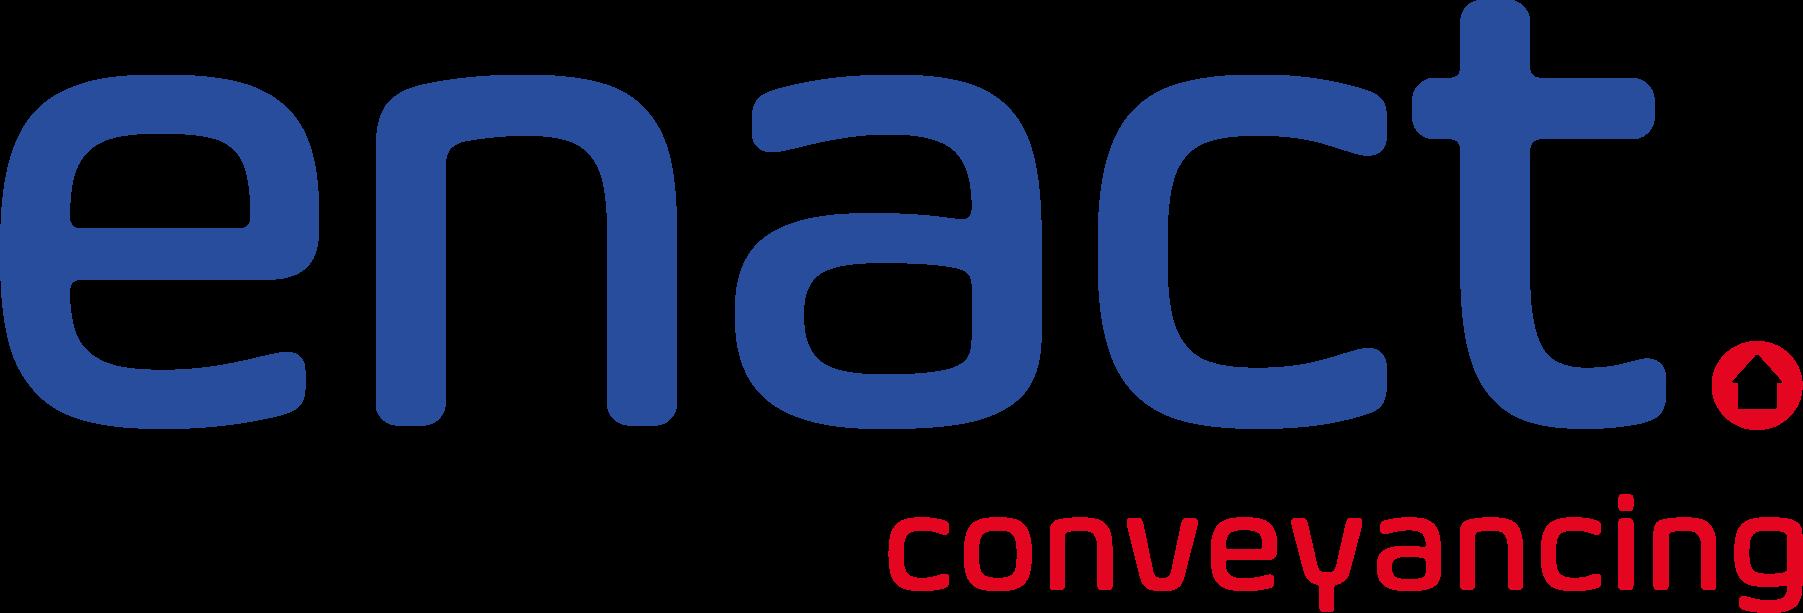 Enact conveyancing reviews read customer service reviews of www enact conveyancing solutioingenieria Gallery